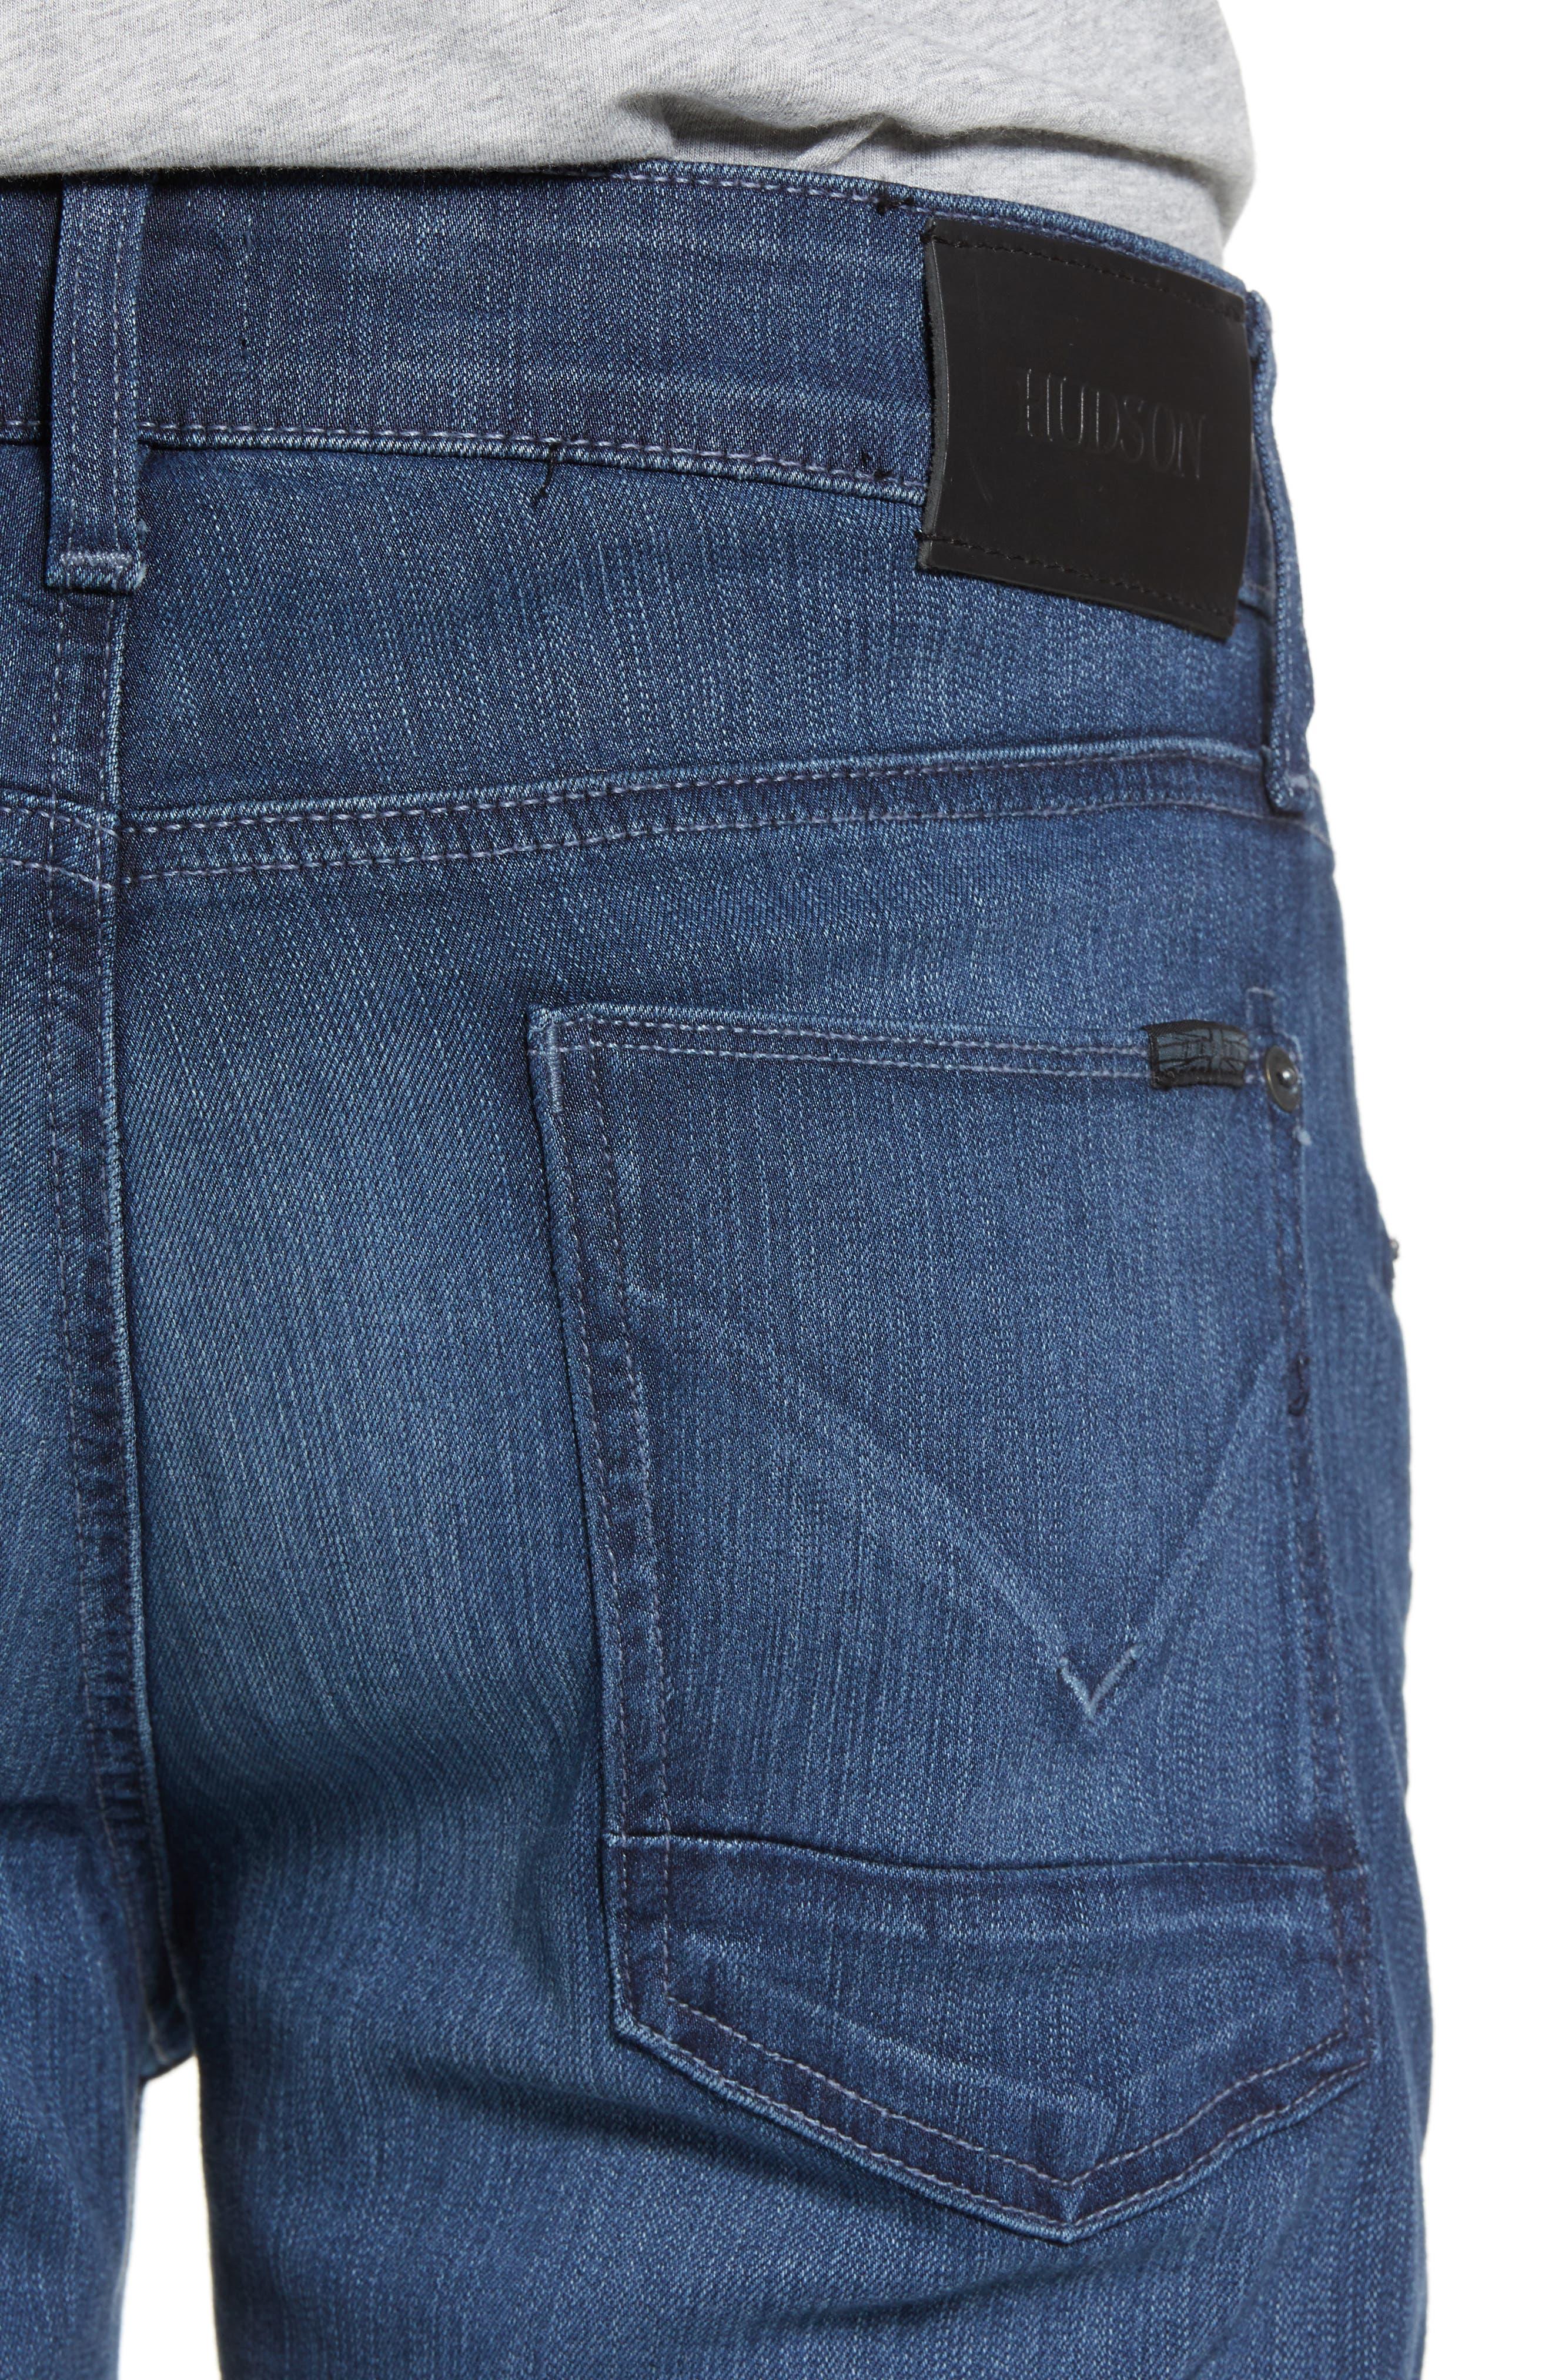 Byron Slim Straight Leg Jeans,                             Alternate thumbnail 3, color,                             Freeman